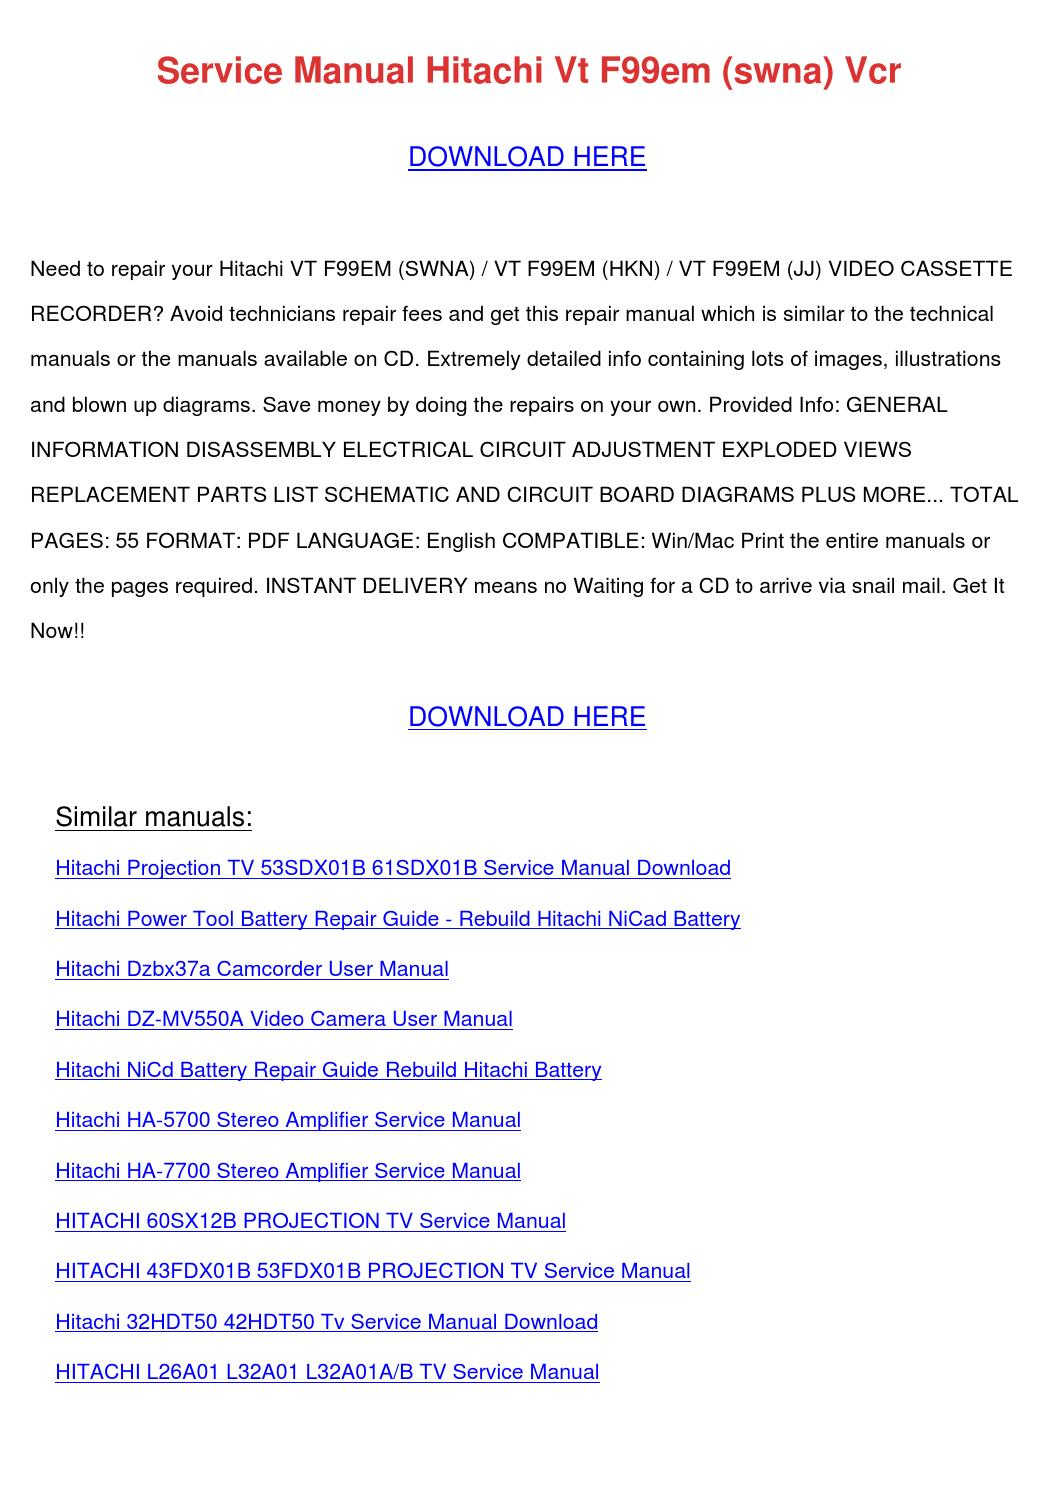 Service Manual Hitachi Vt F99em Swna Vcr by DenishaClick - issuu